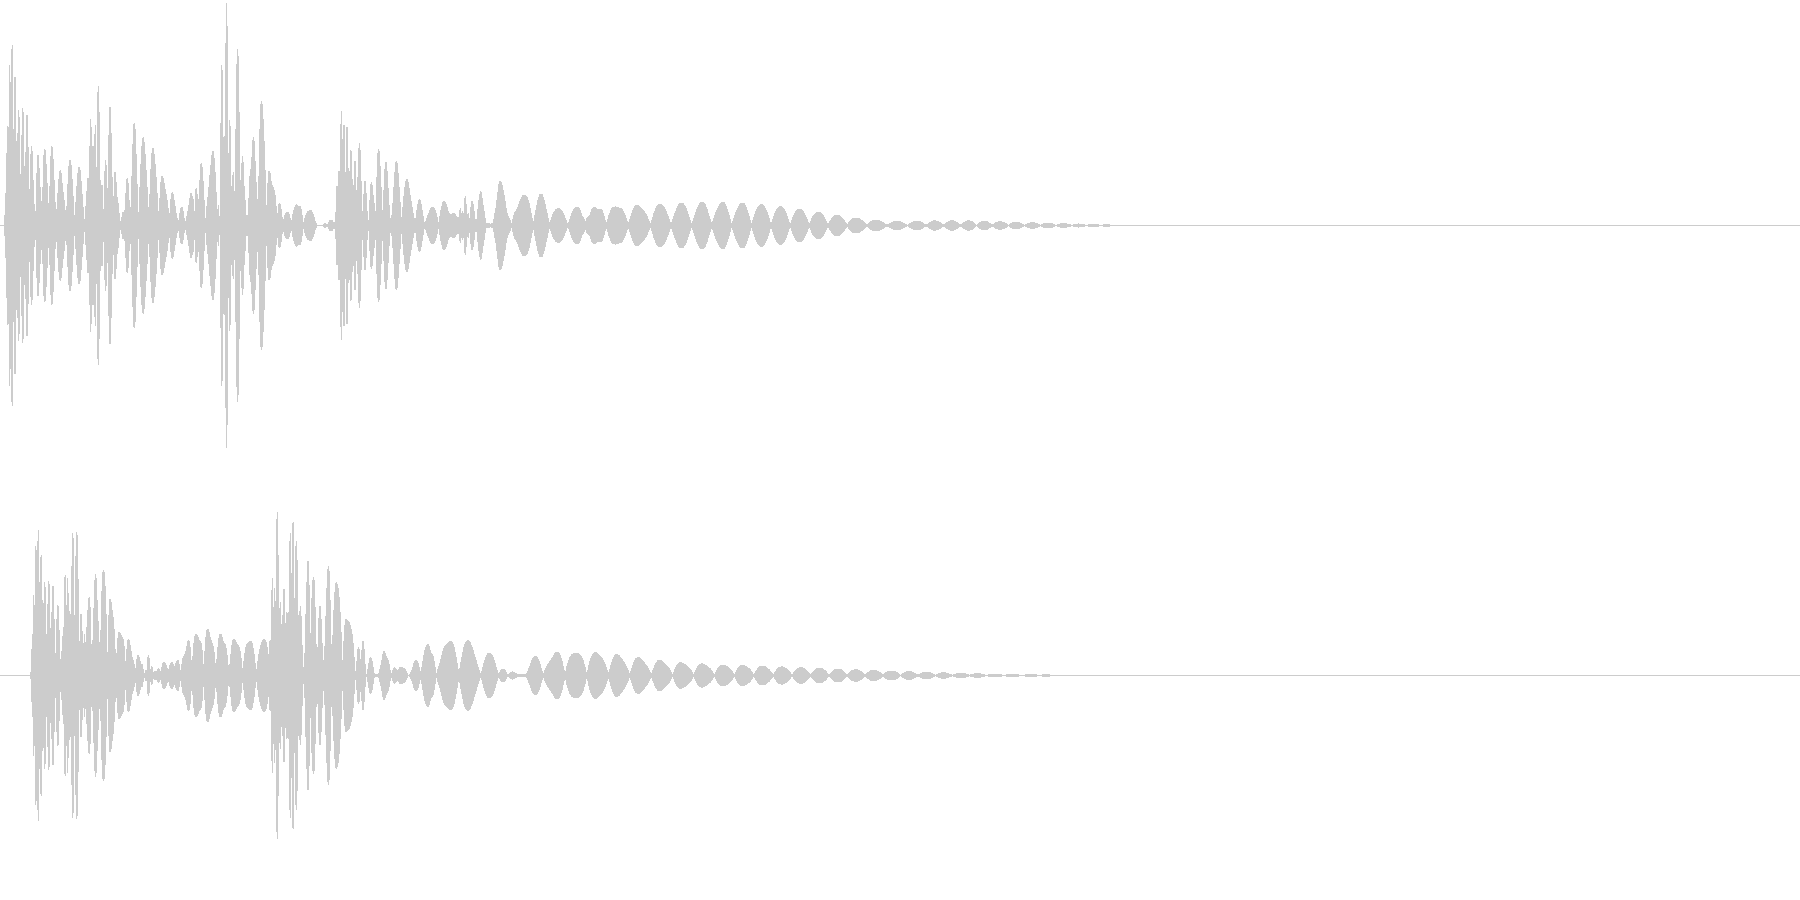 HeartBeat 心臓の音 6 単発の未再生の波形